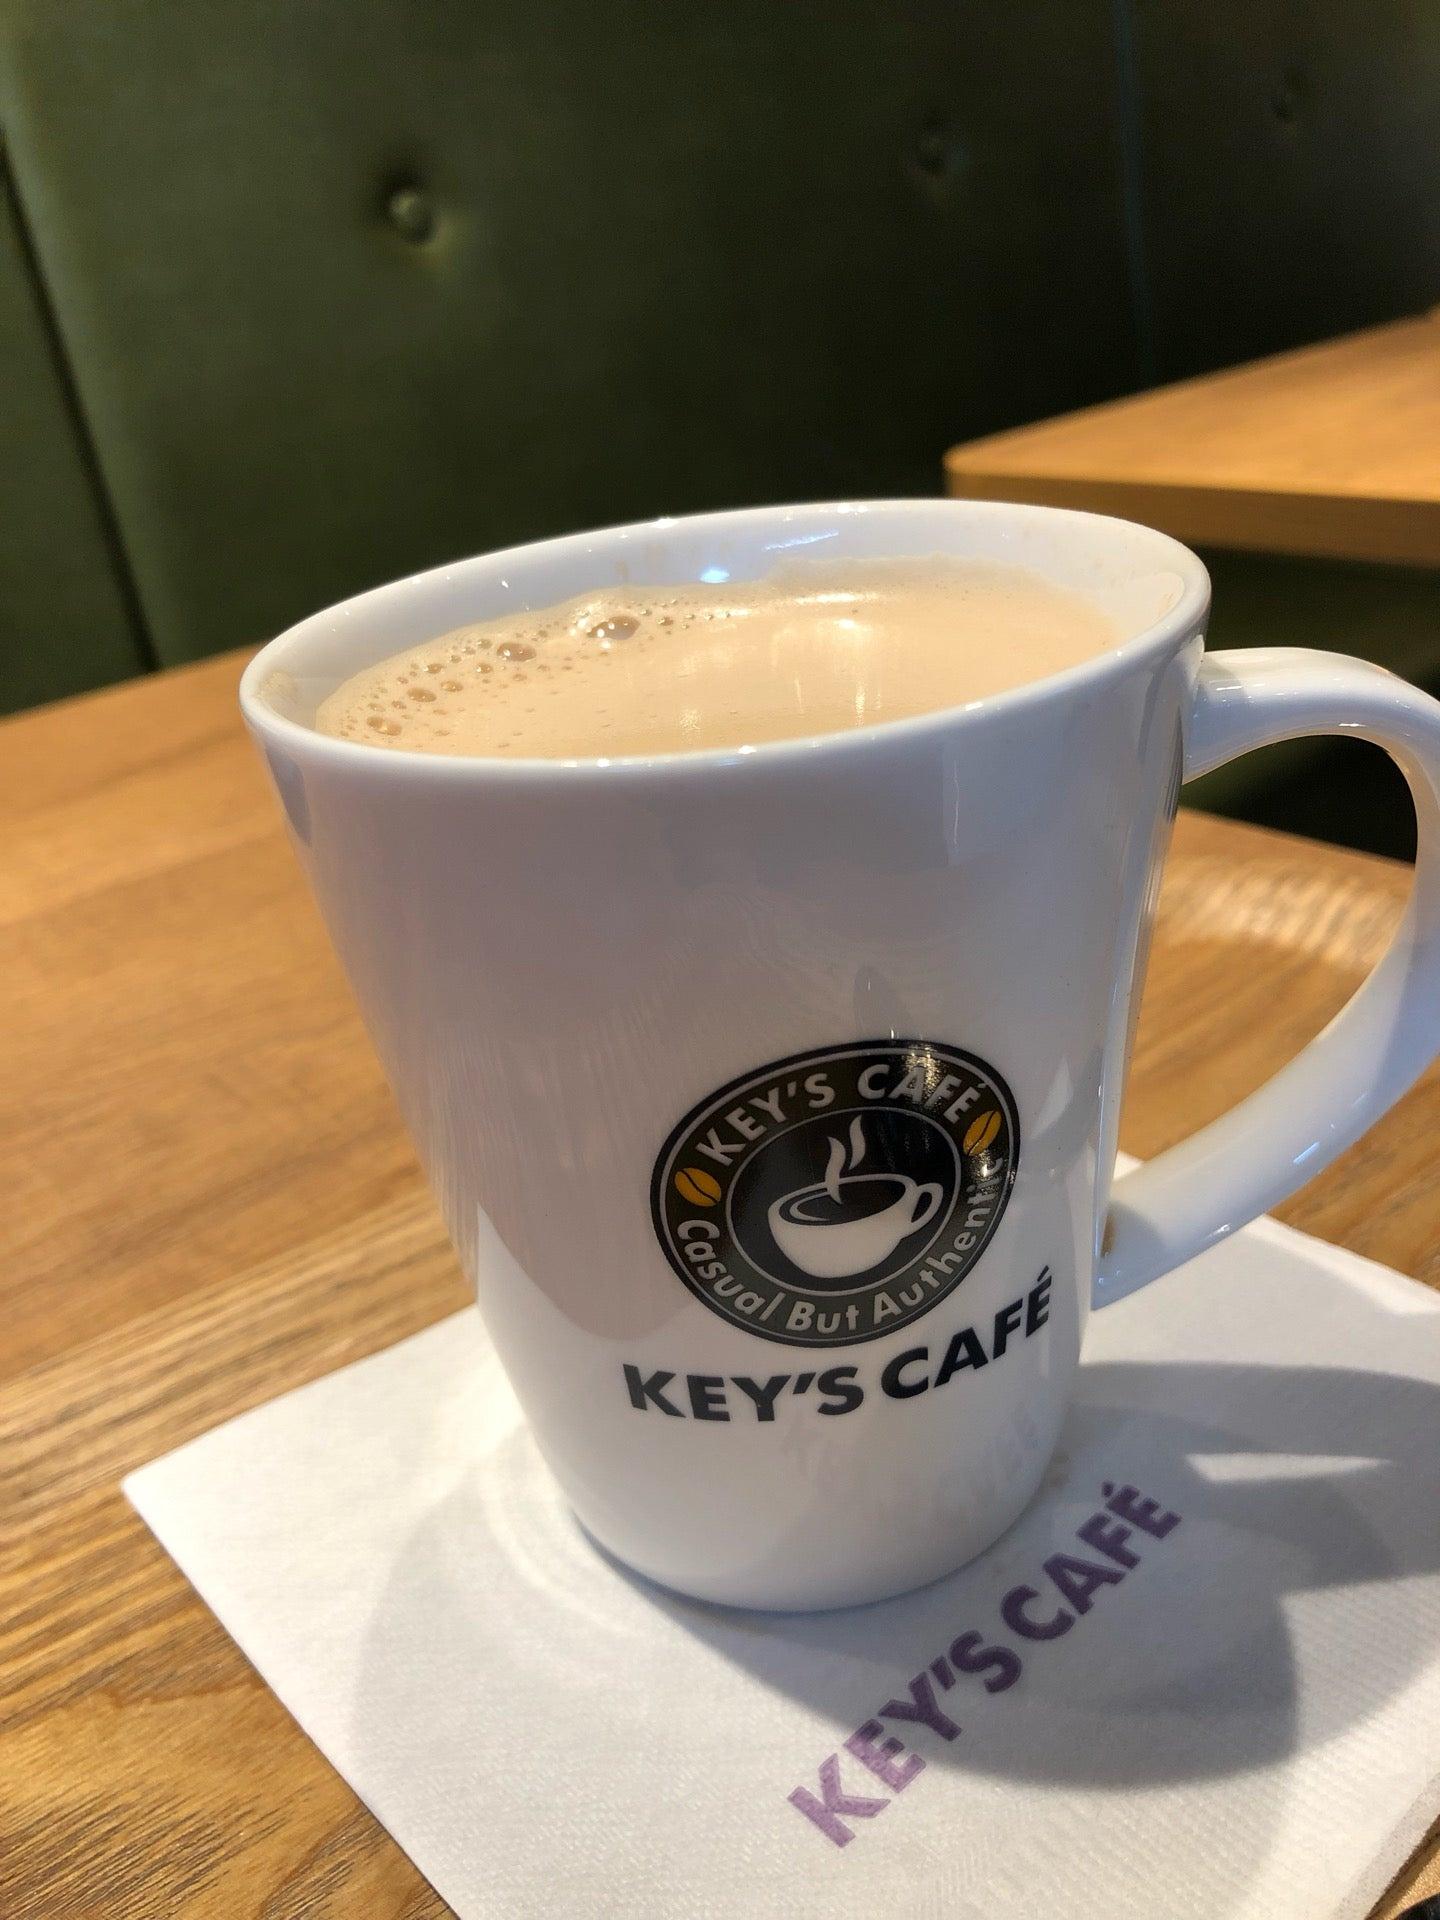 KEY'S CAFE (@ キーズカフェ ビックカメラ名古屋JRゲートタワー店 - @bic_keyscafe in 名古屋市, 愛知県) https://t.co/Gu9i3oFBCh https://t.co/se9cqRY4aW